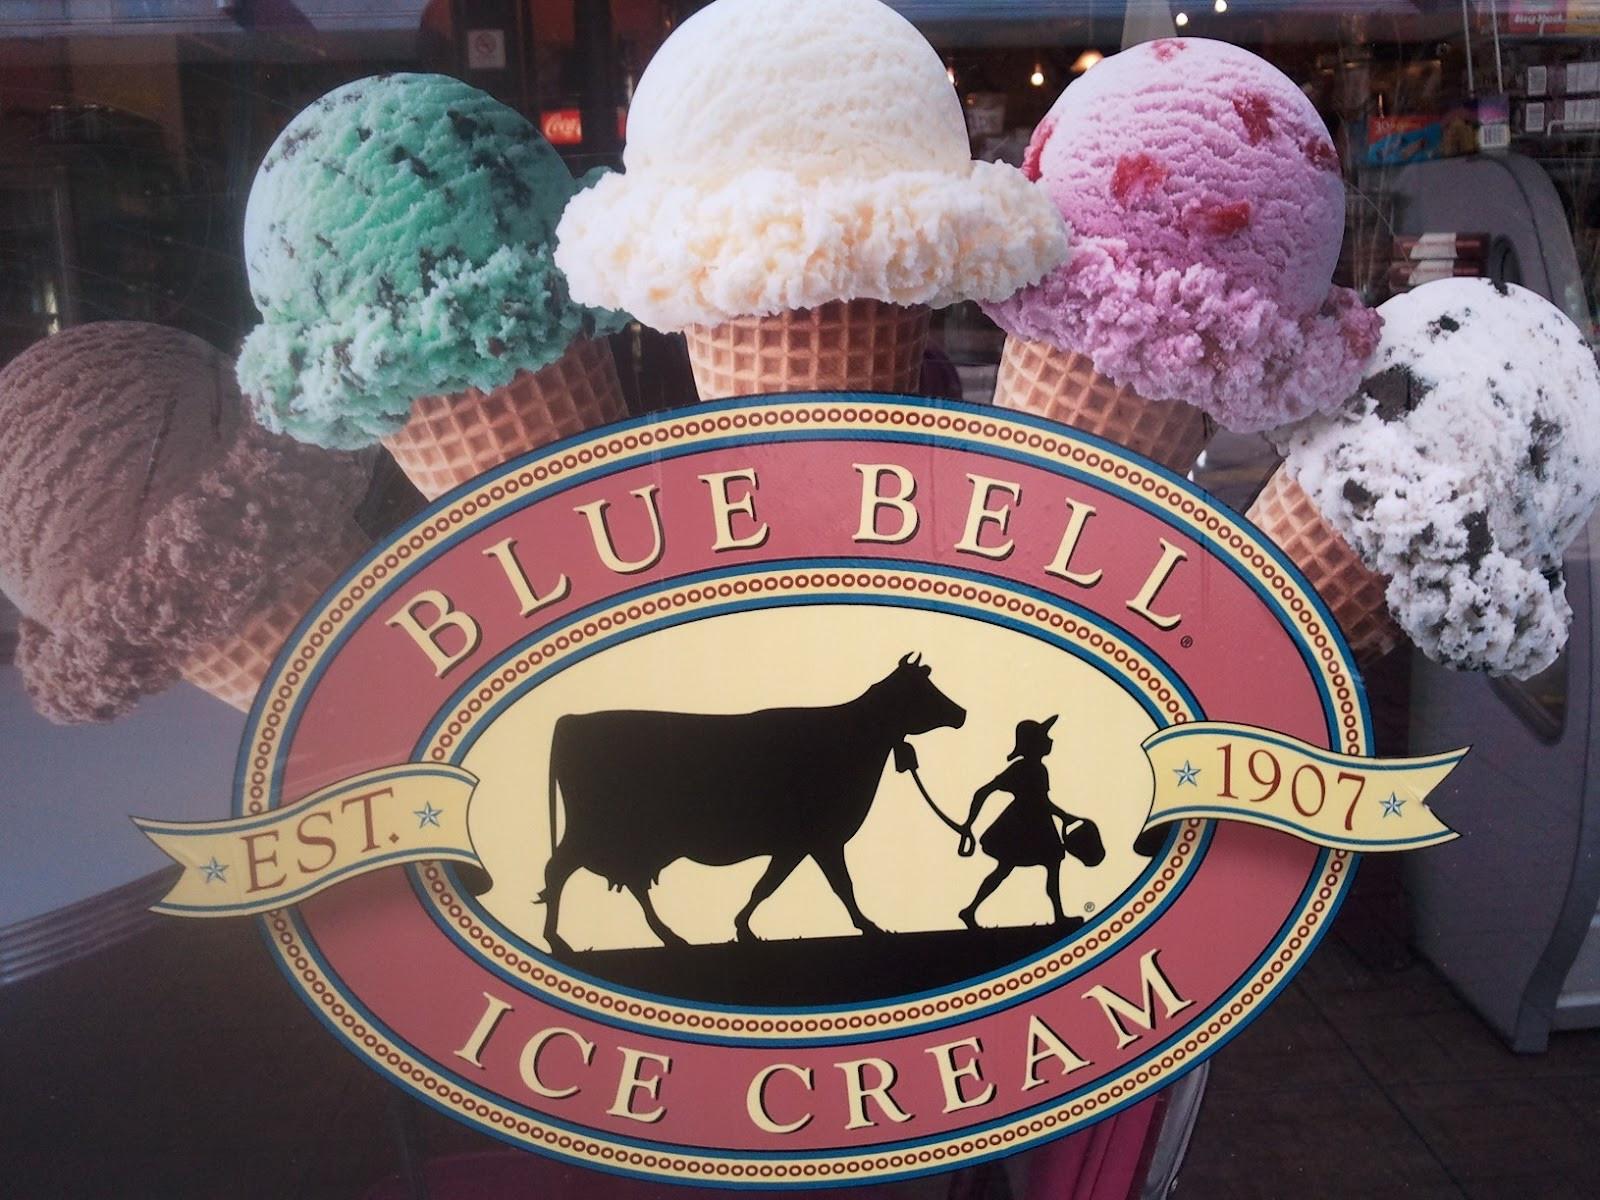 Blue Bell Birthday Cake Ice Cream  Foo Uncensored Blue Bell s Birthday Cake Ice Cream